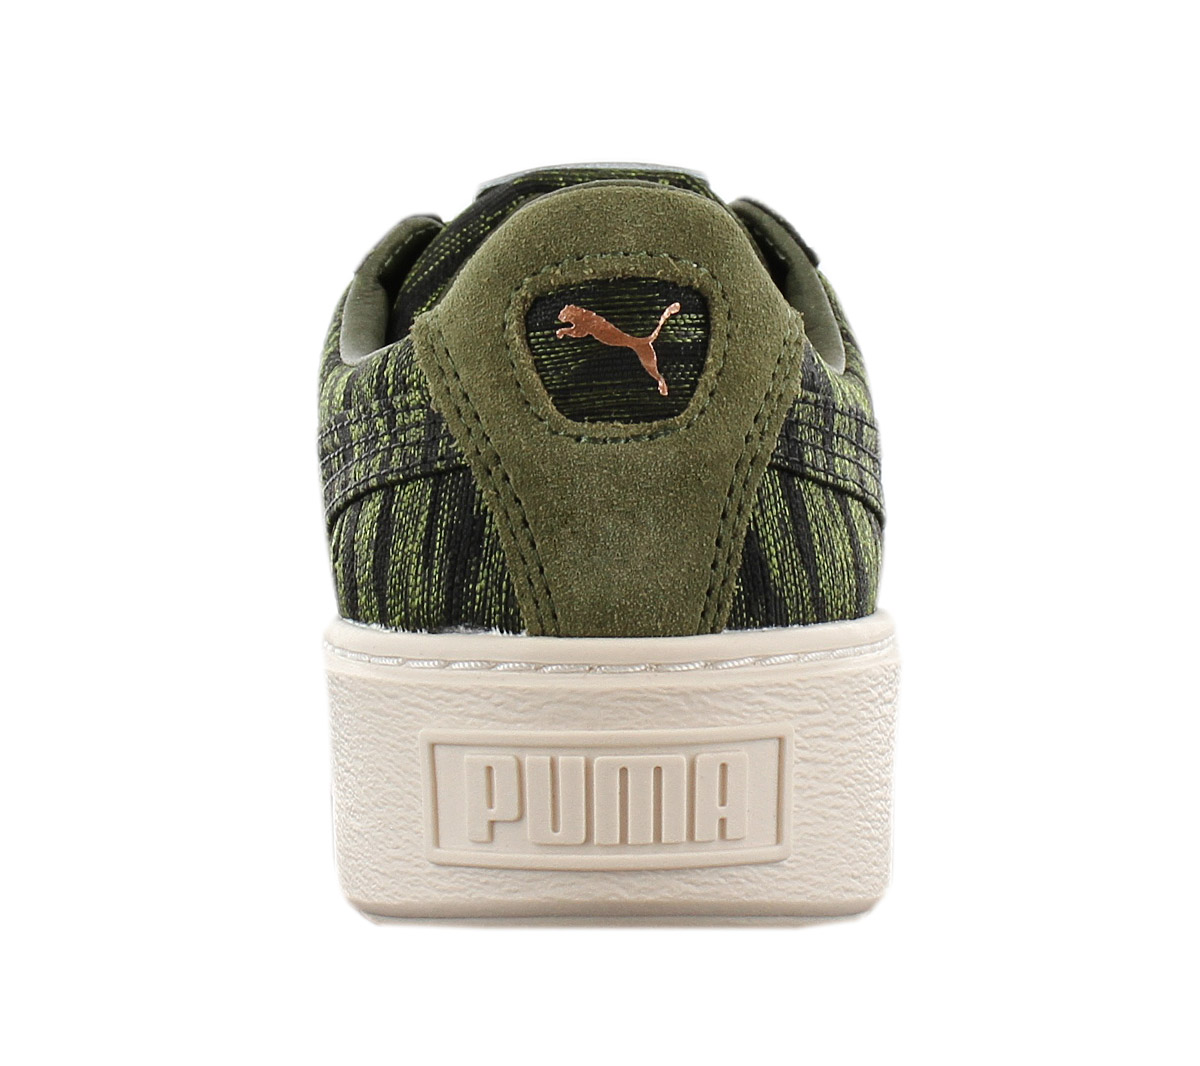 Puma Basket Platform VR Womens Sneaker Shoes Olive Green 364092 01 Sneakers NEW